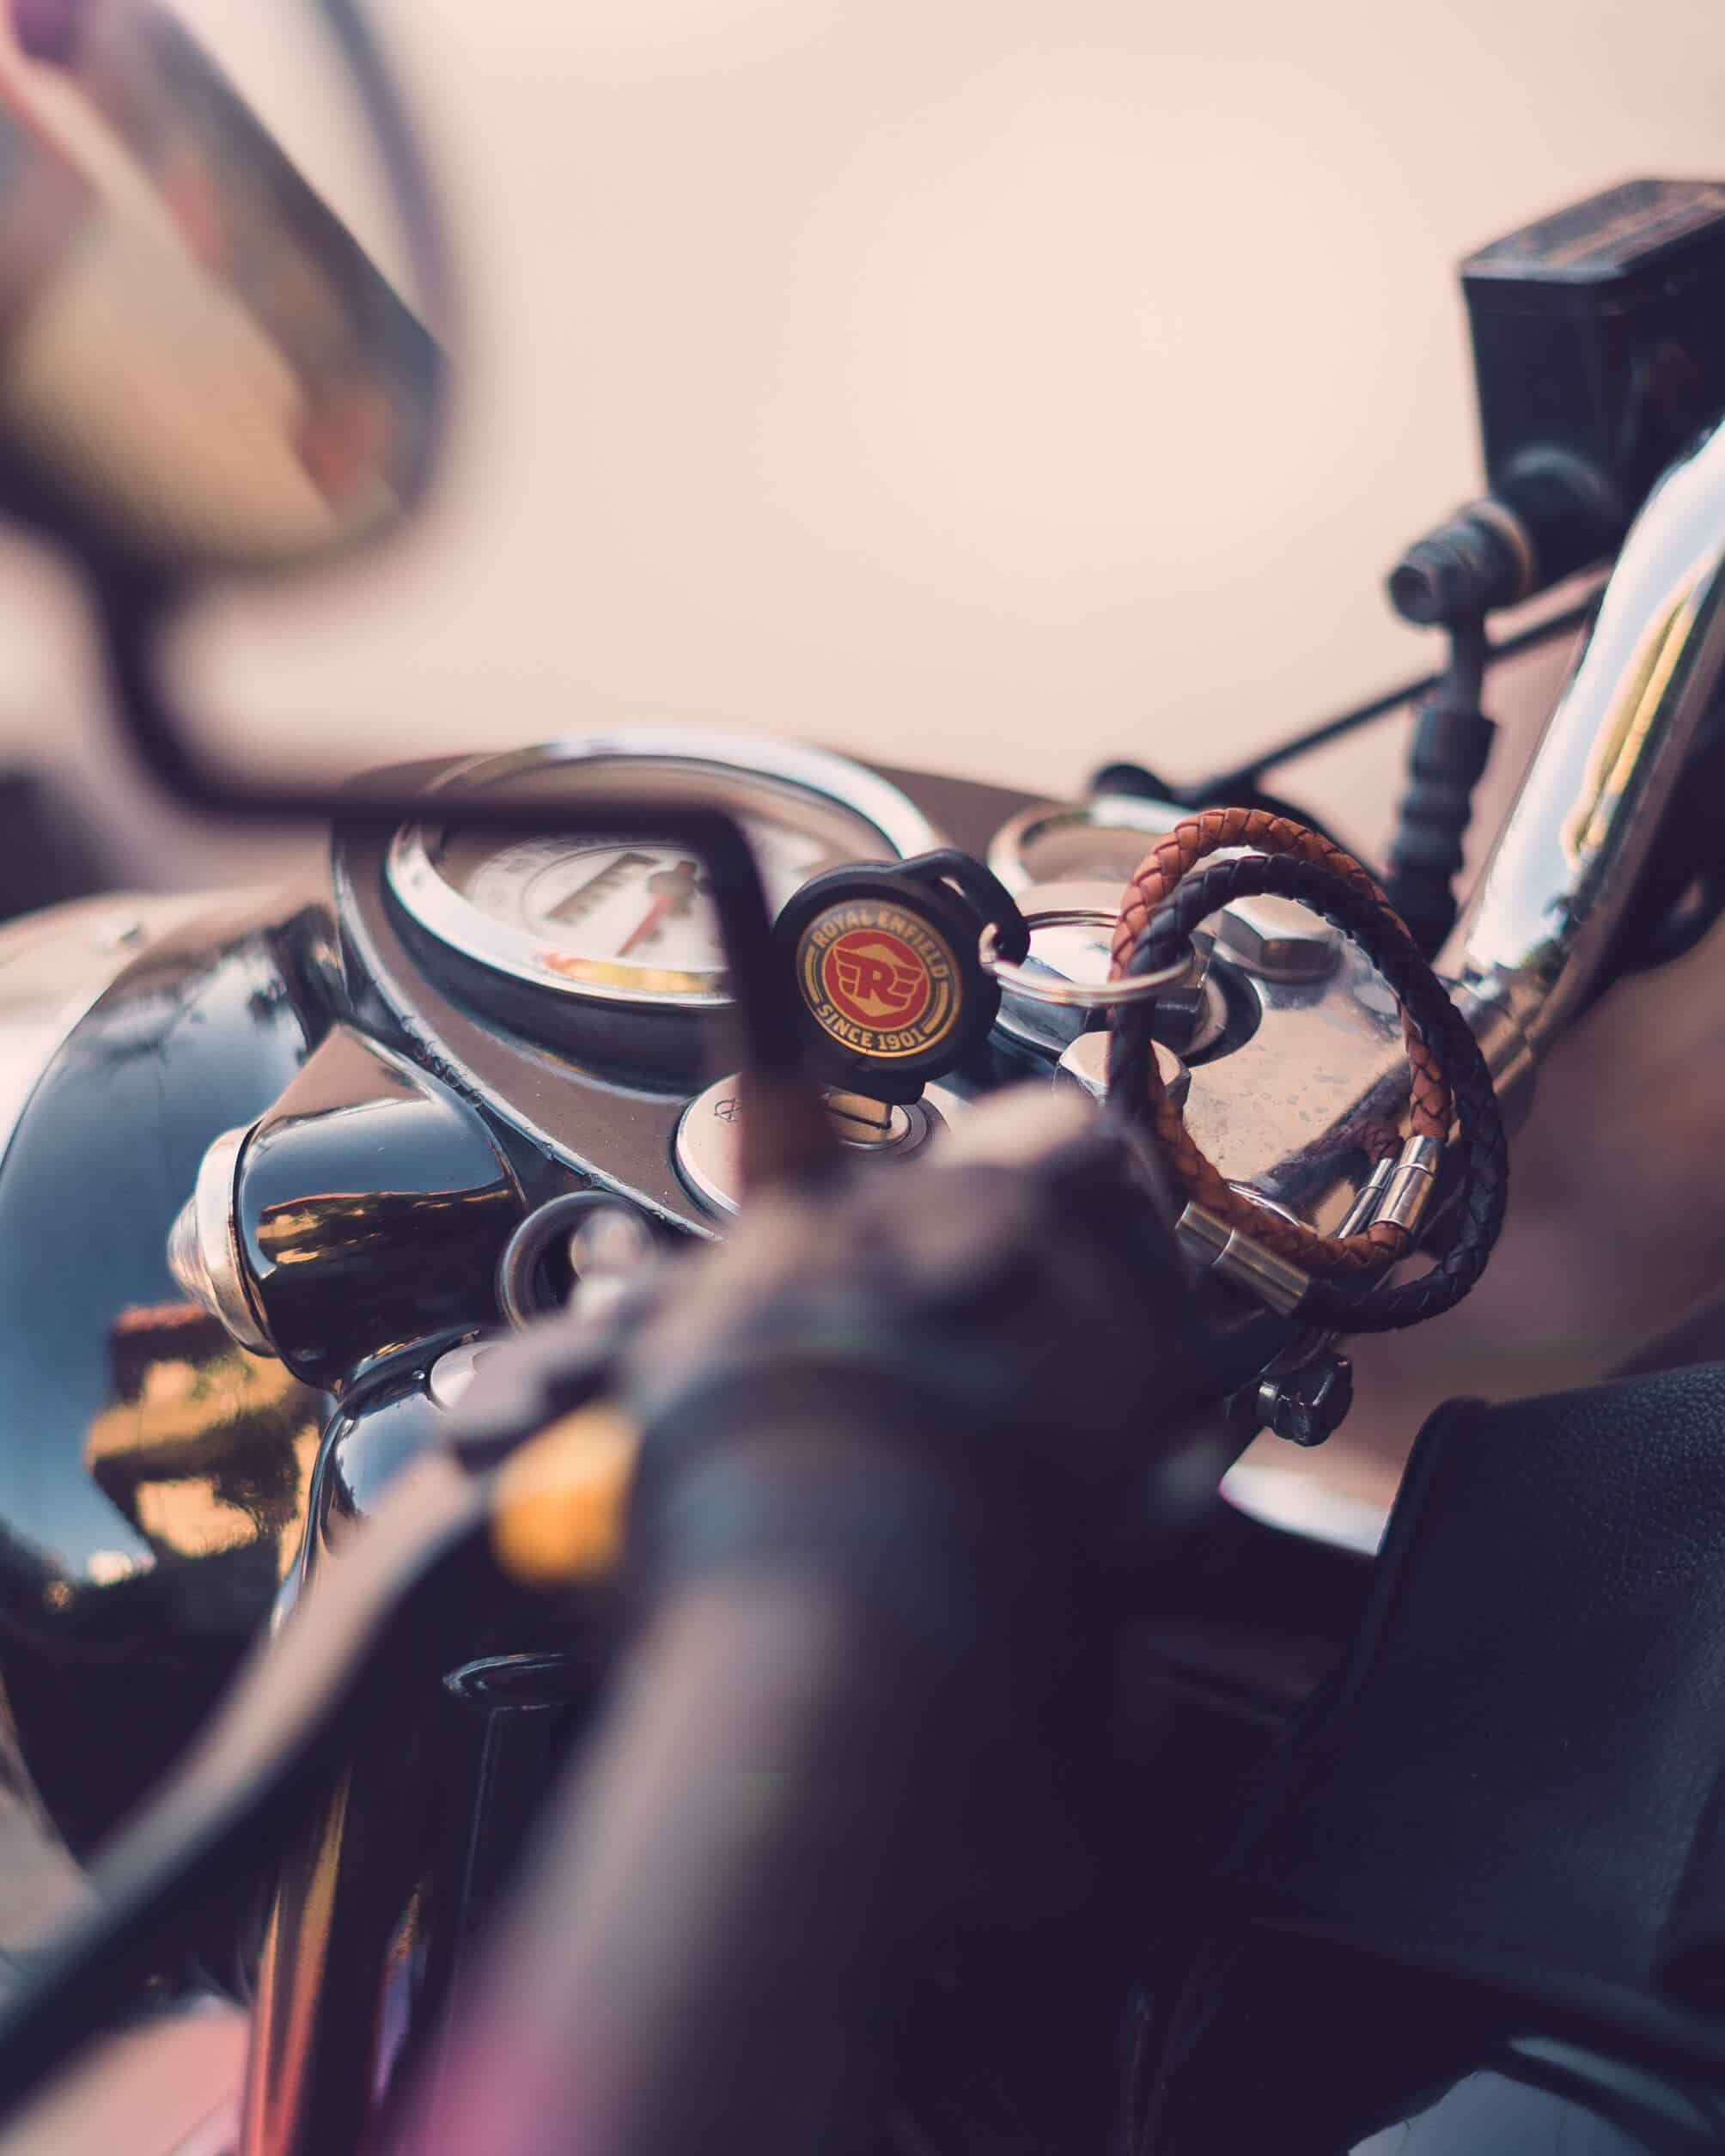 Key Bike - Contact Page